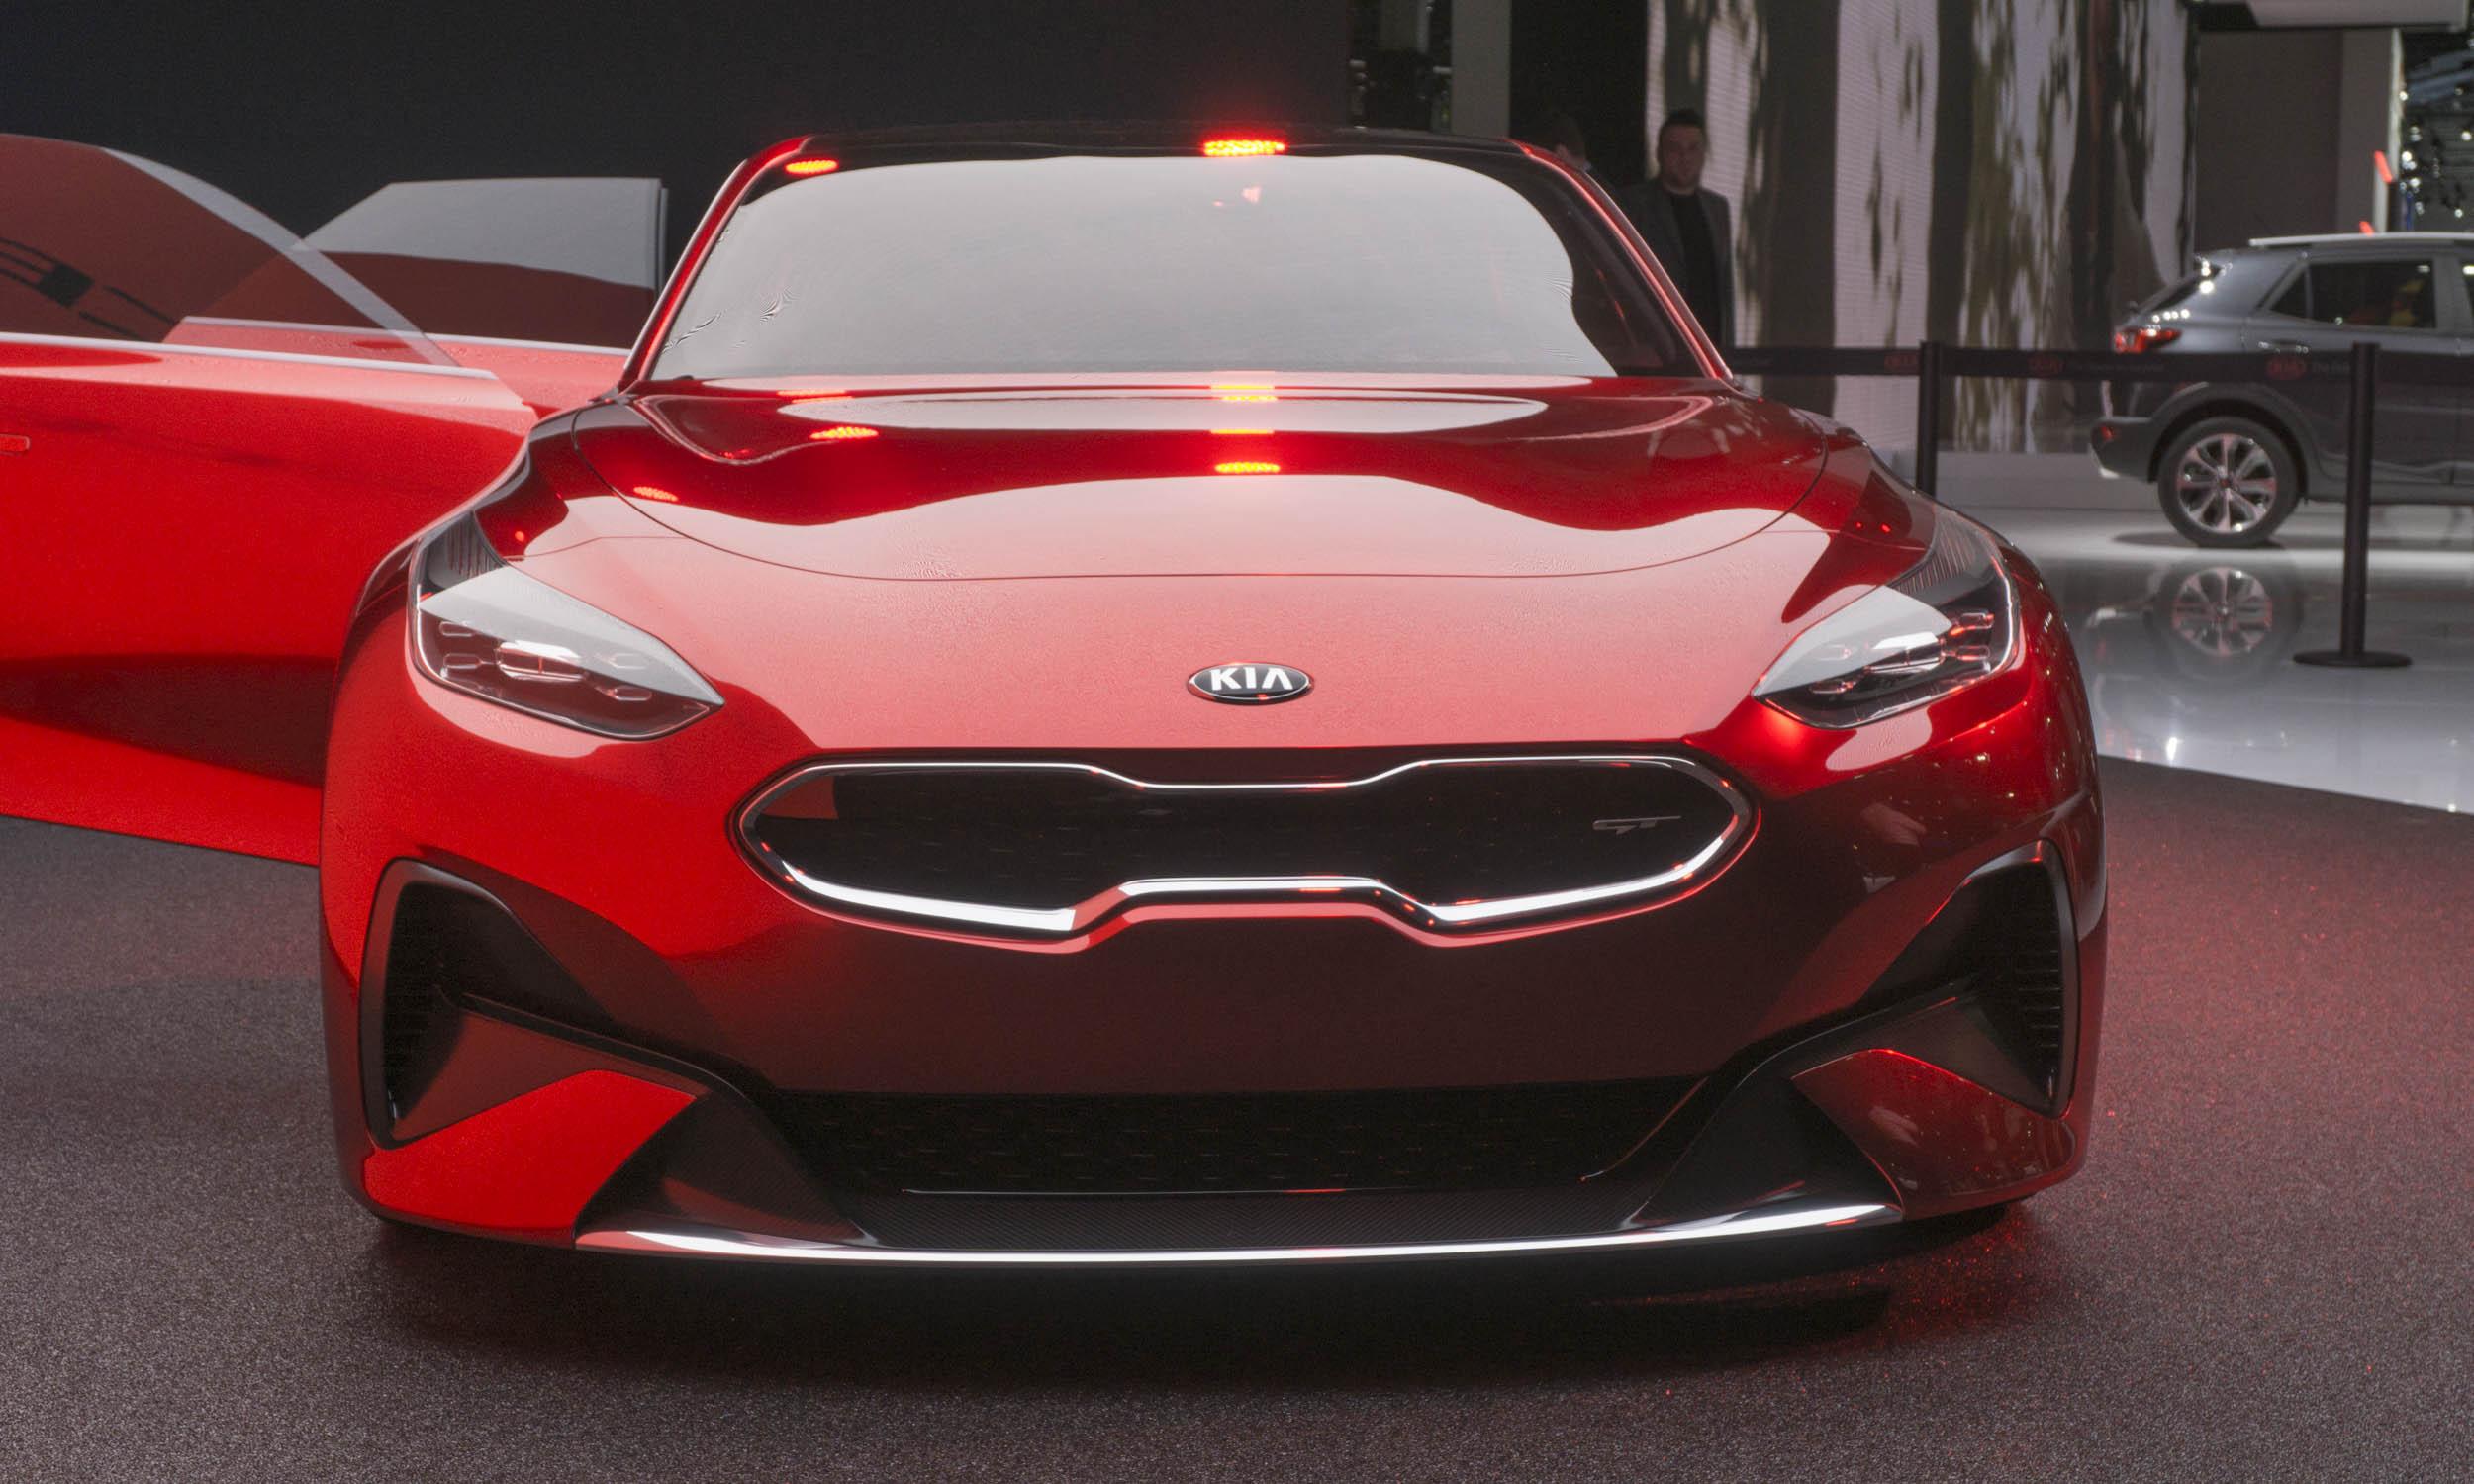 Frankfurt Motor Show 2017 Kia Proceed Concept Autonxt Pro Ceed Perry Stern Automotive Content Experience